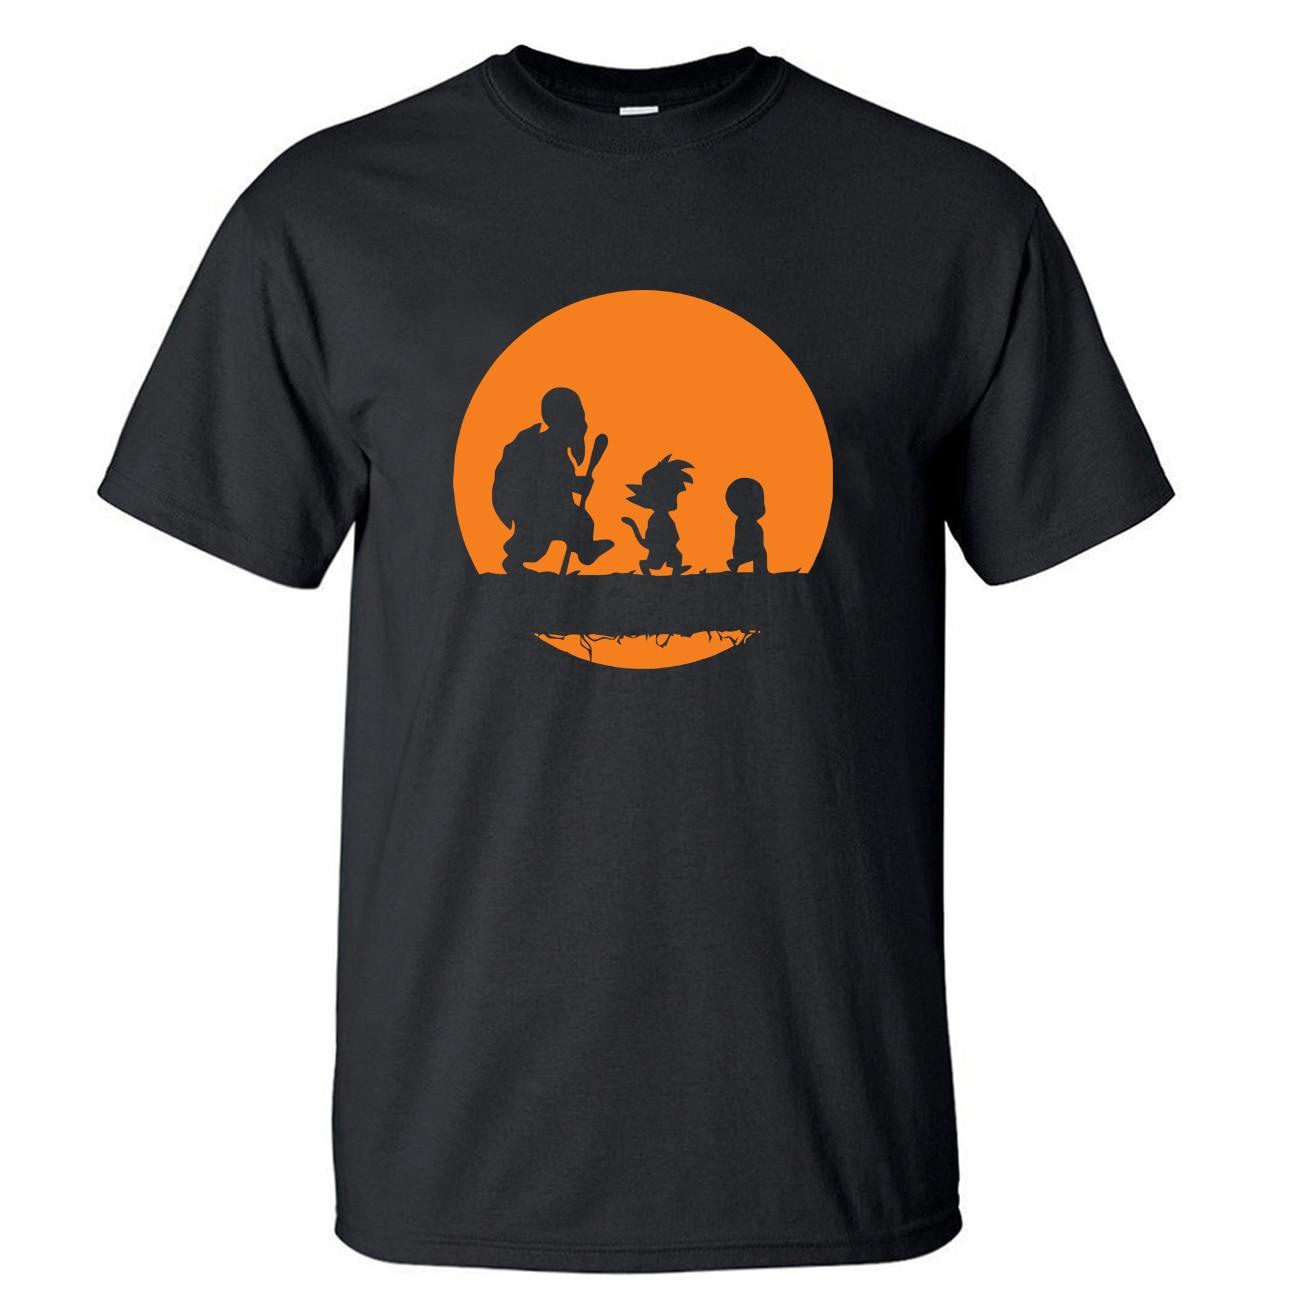 Camiseta de Dragon Ball para hombre Kuririn Japón, camiseta de Anime Vaporwave, camisetas de verano Master Roshi Gohan, camisetas de manga corta Harajuku